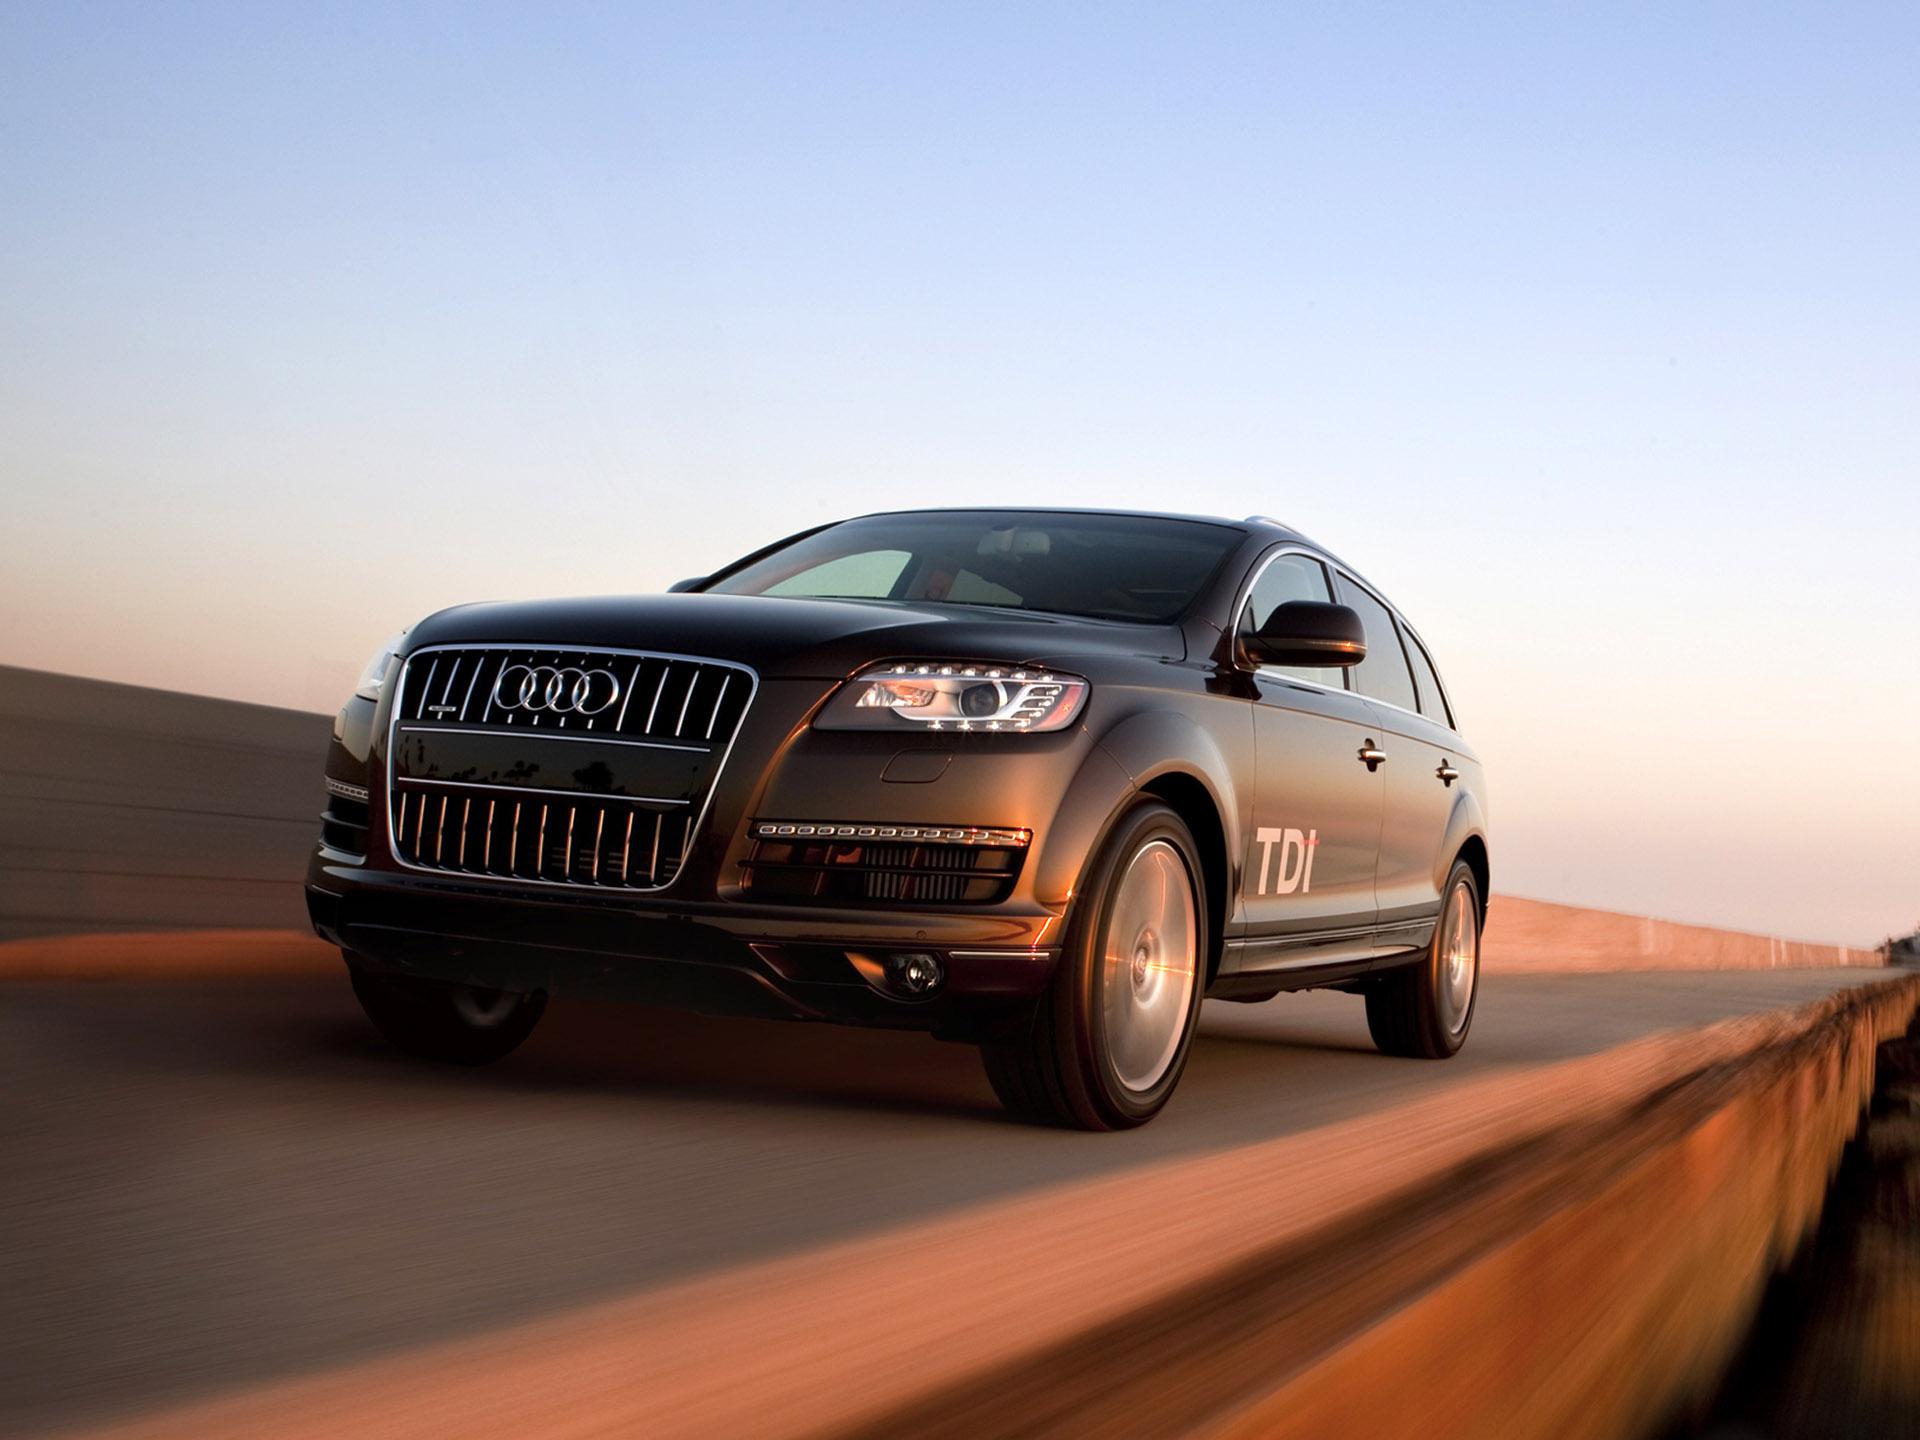 Audi Q7 3 0 Tdi Clean Diesel Quattro 10 アウディに嵌まる 壁紙画像ブログ